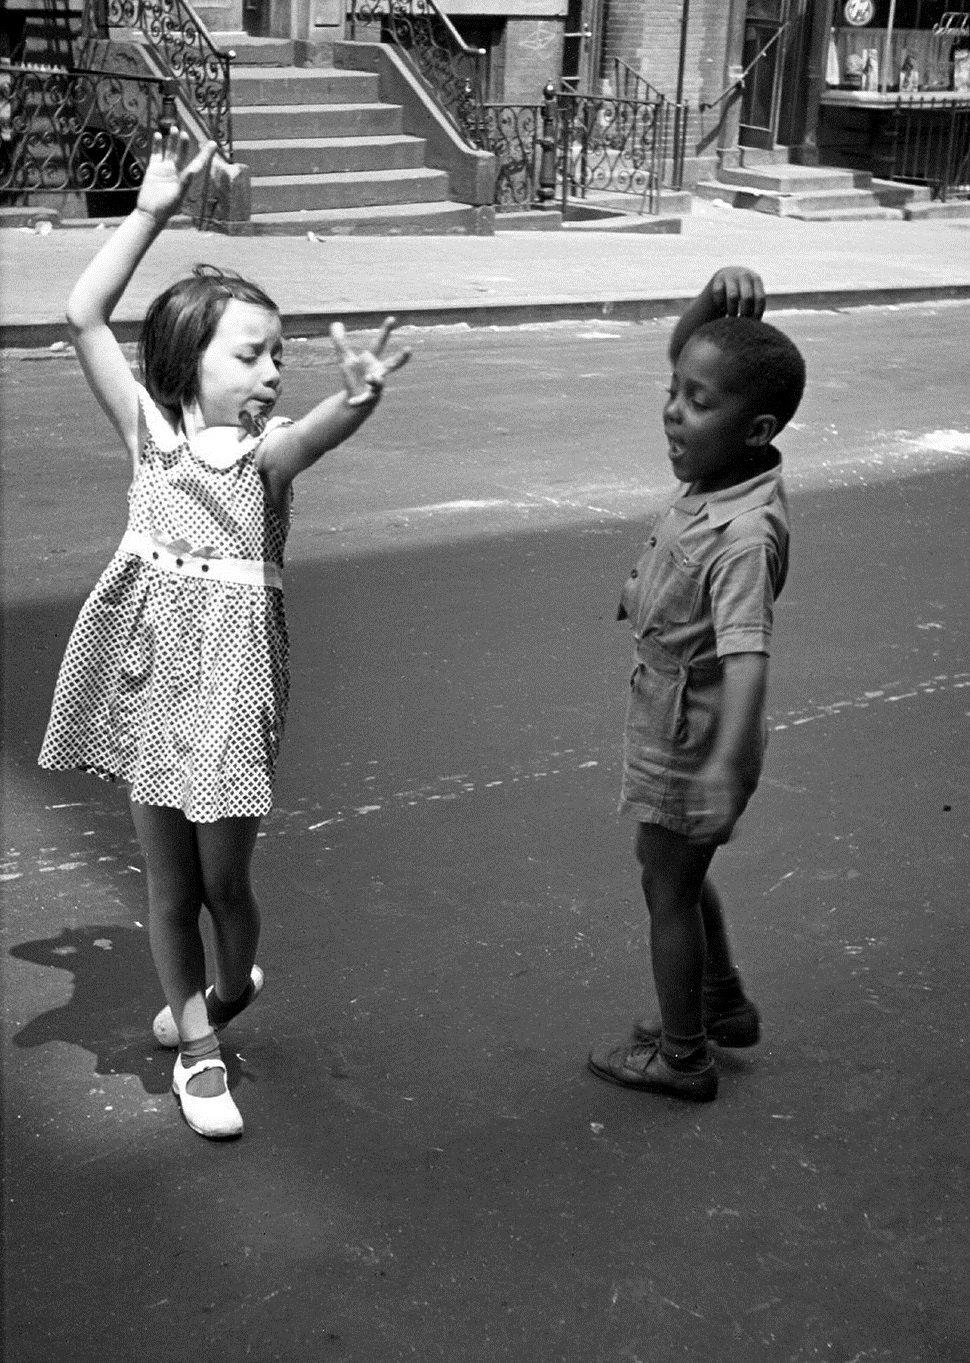 Photo by helen levitt new york 1940